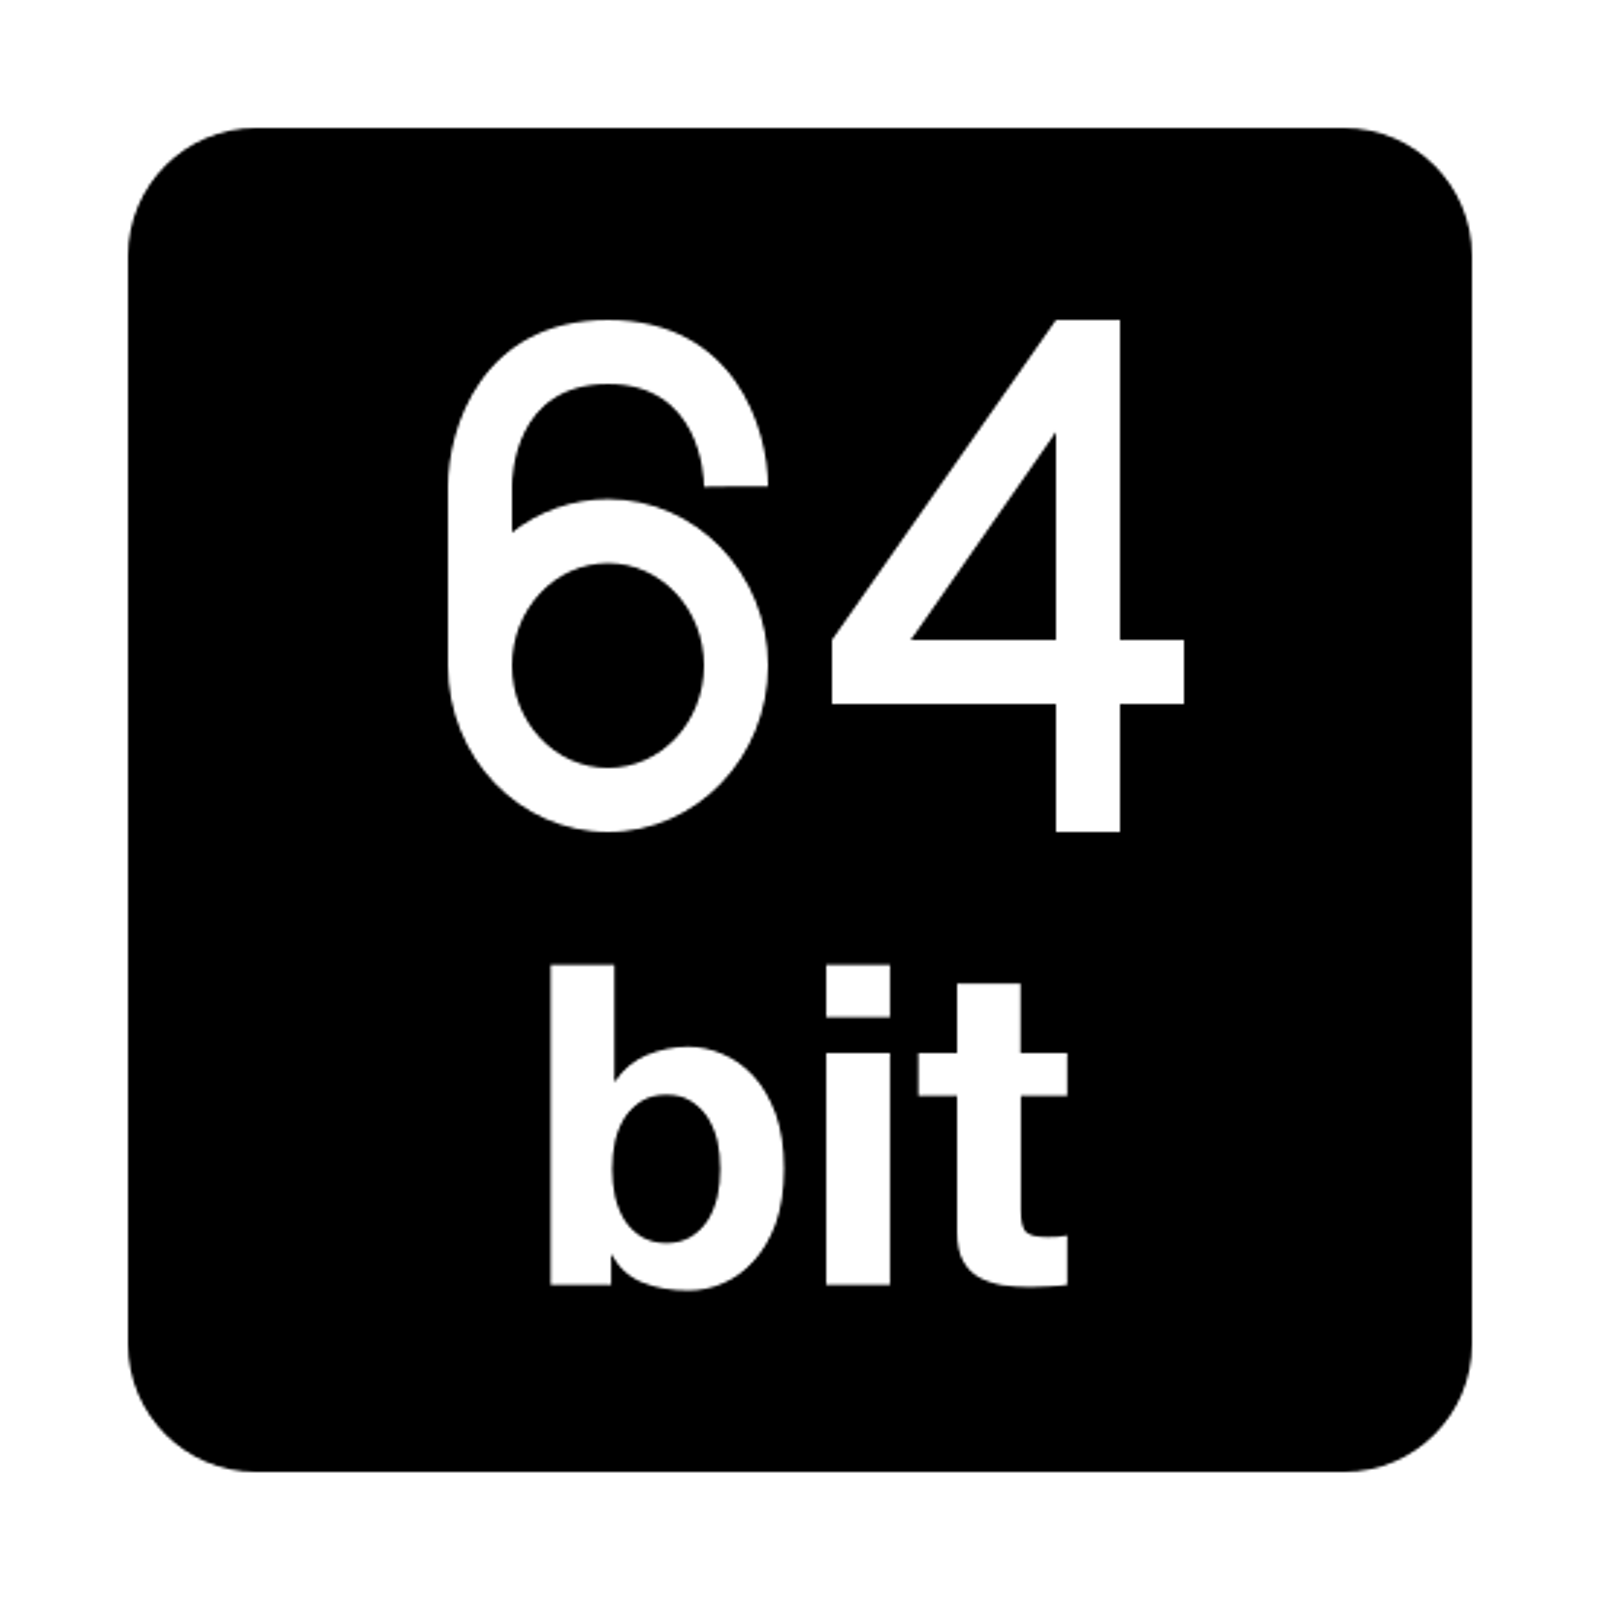 64-bit Filled icon